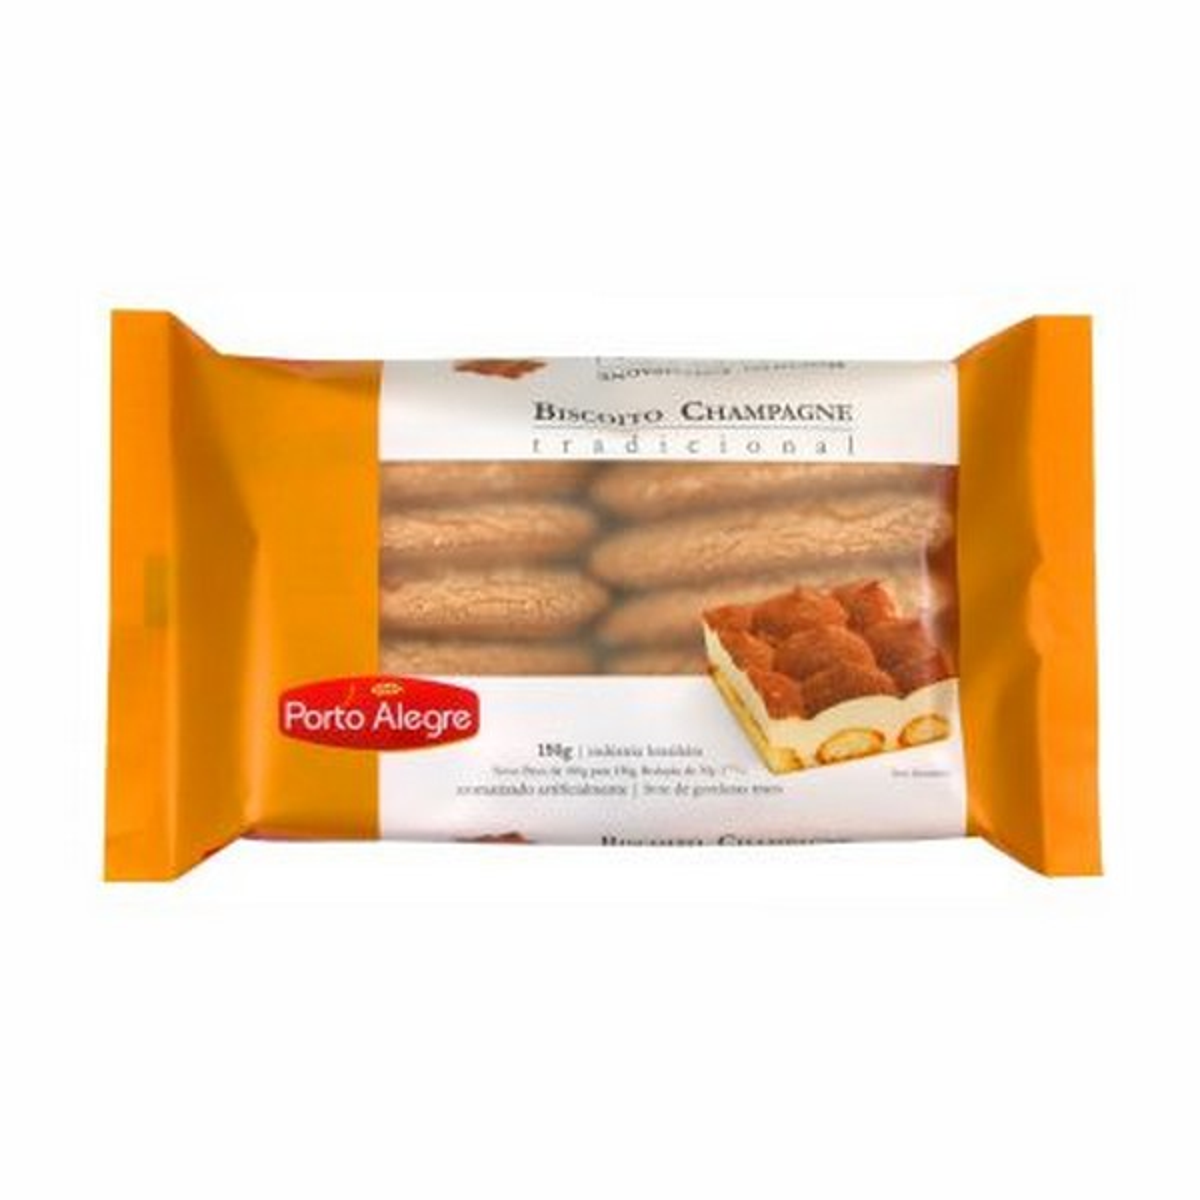 Distribuidora de biscoitos sp